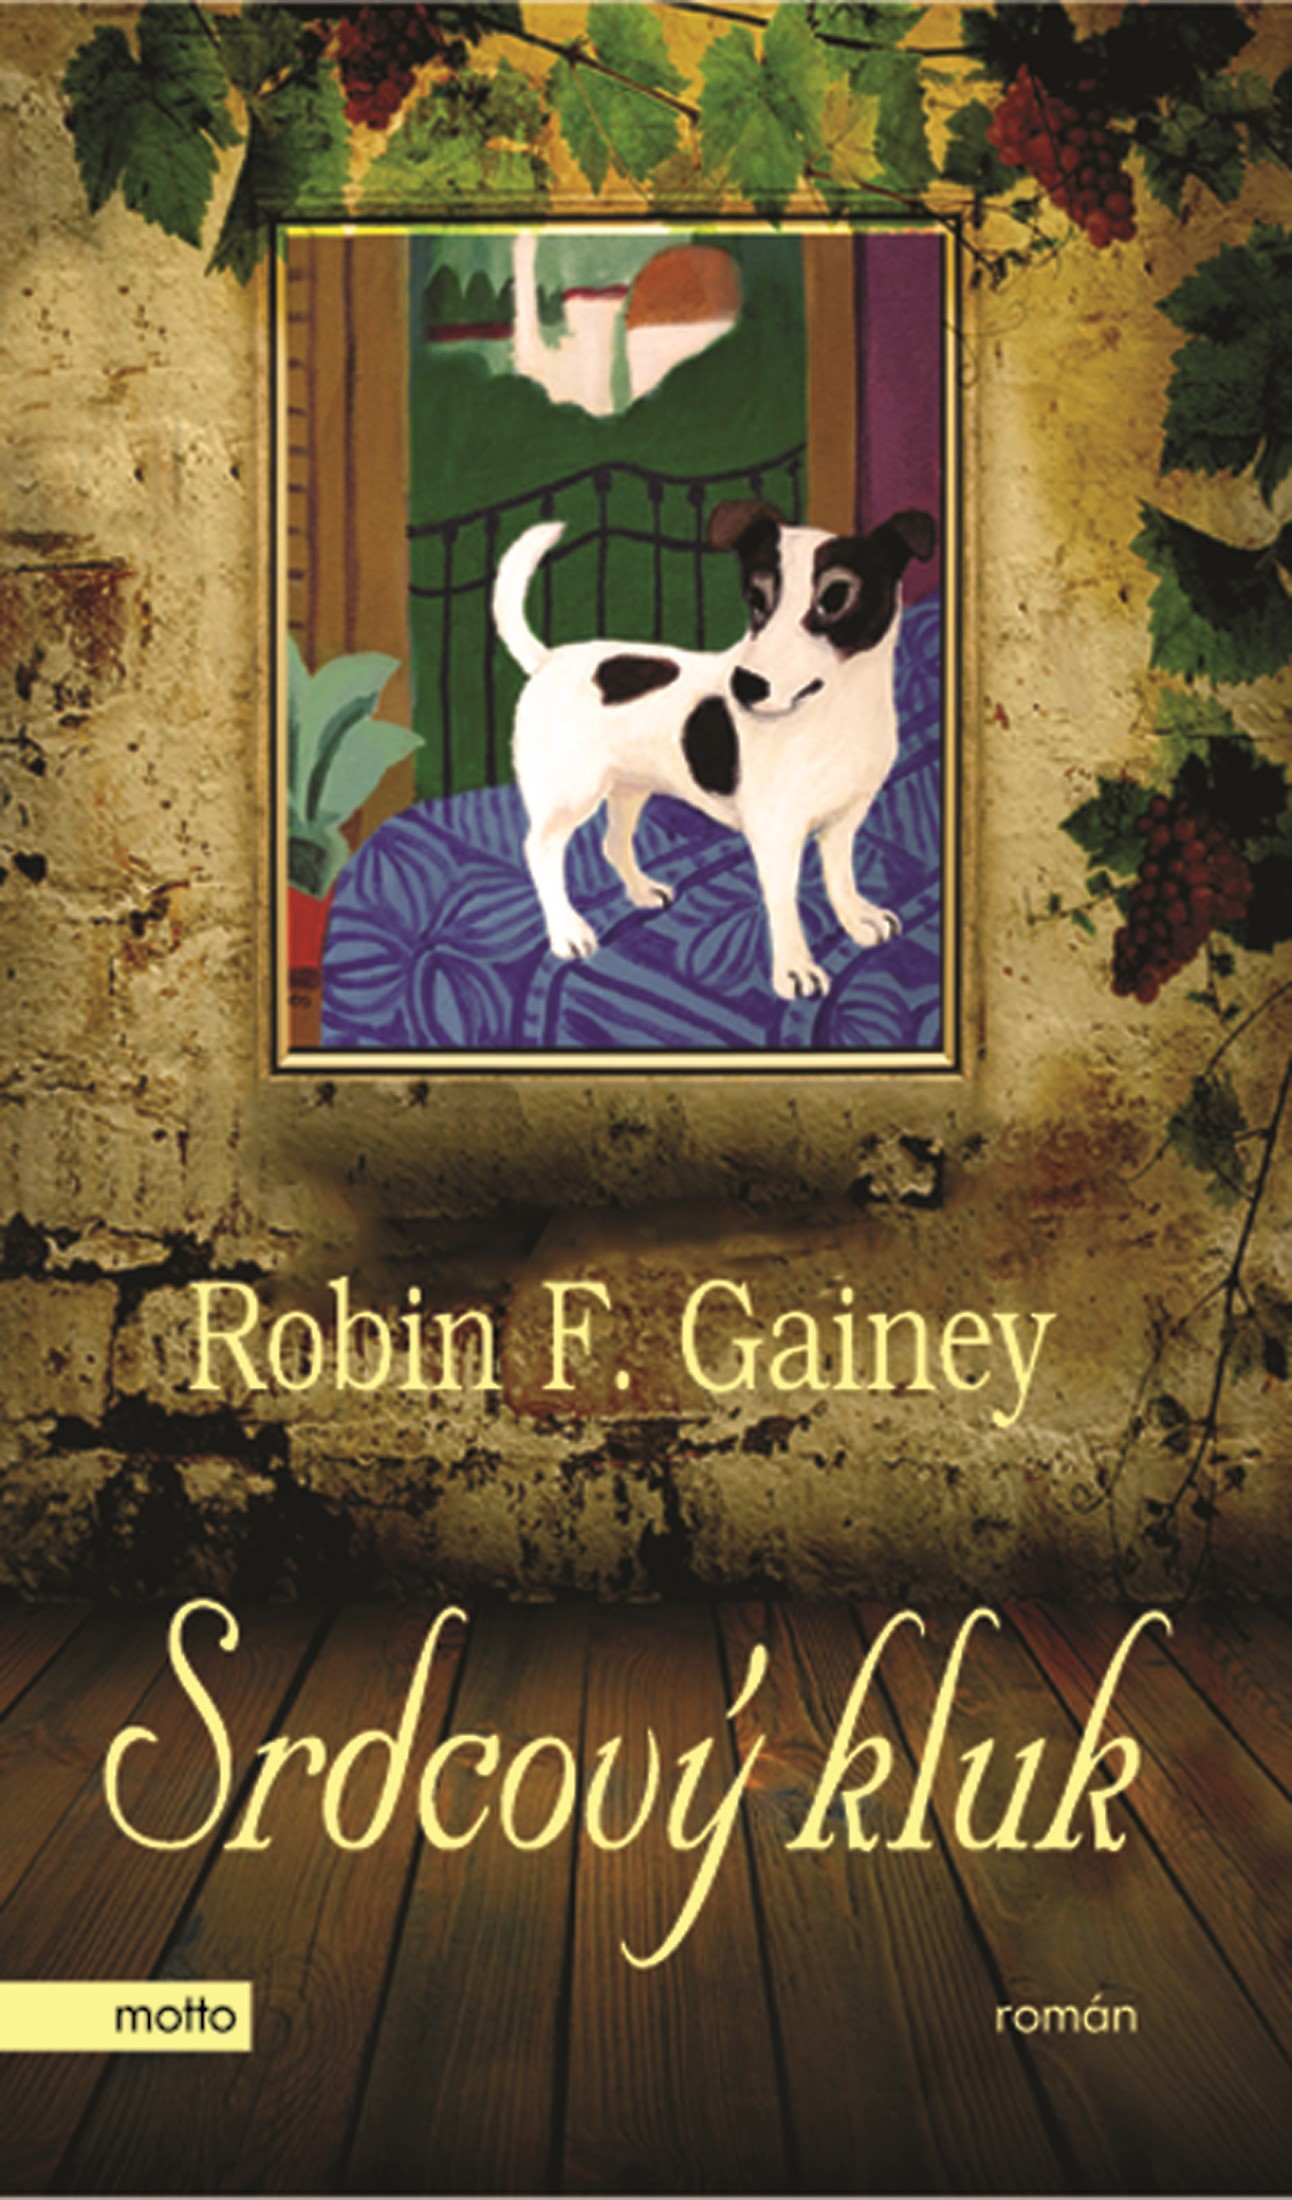 Srdcový kluk | Robin F. Gainey